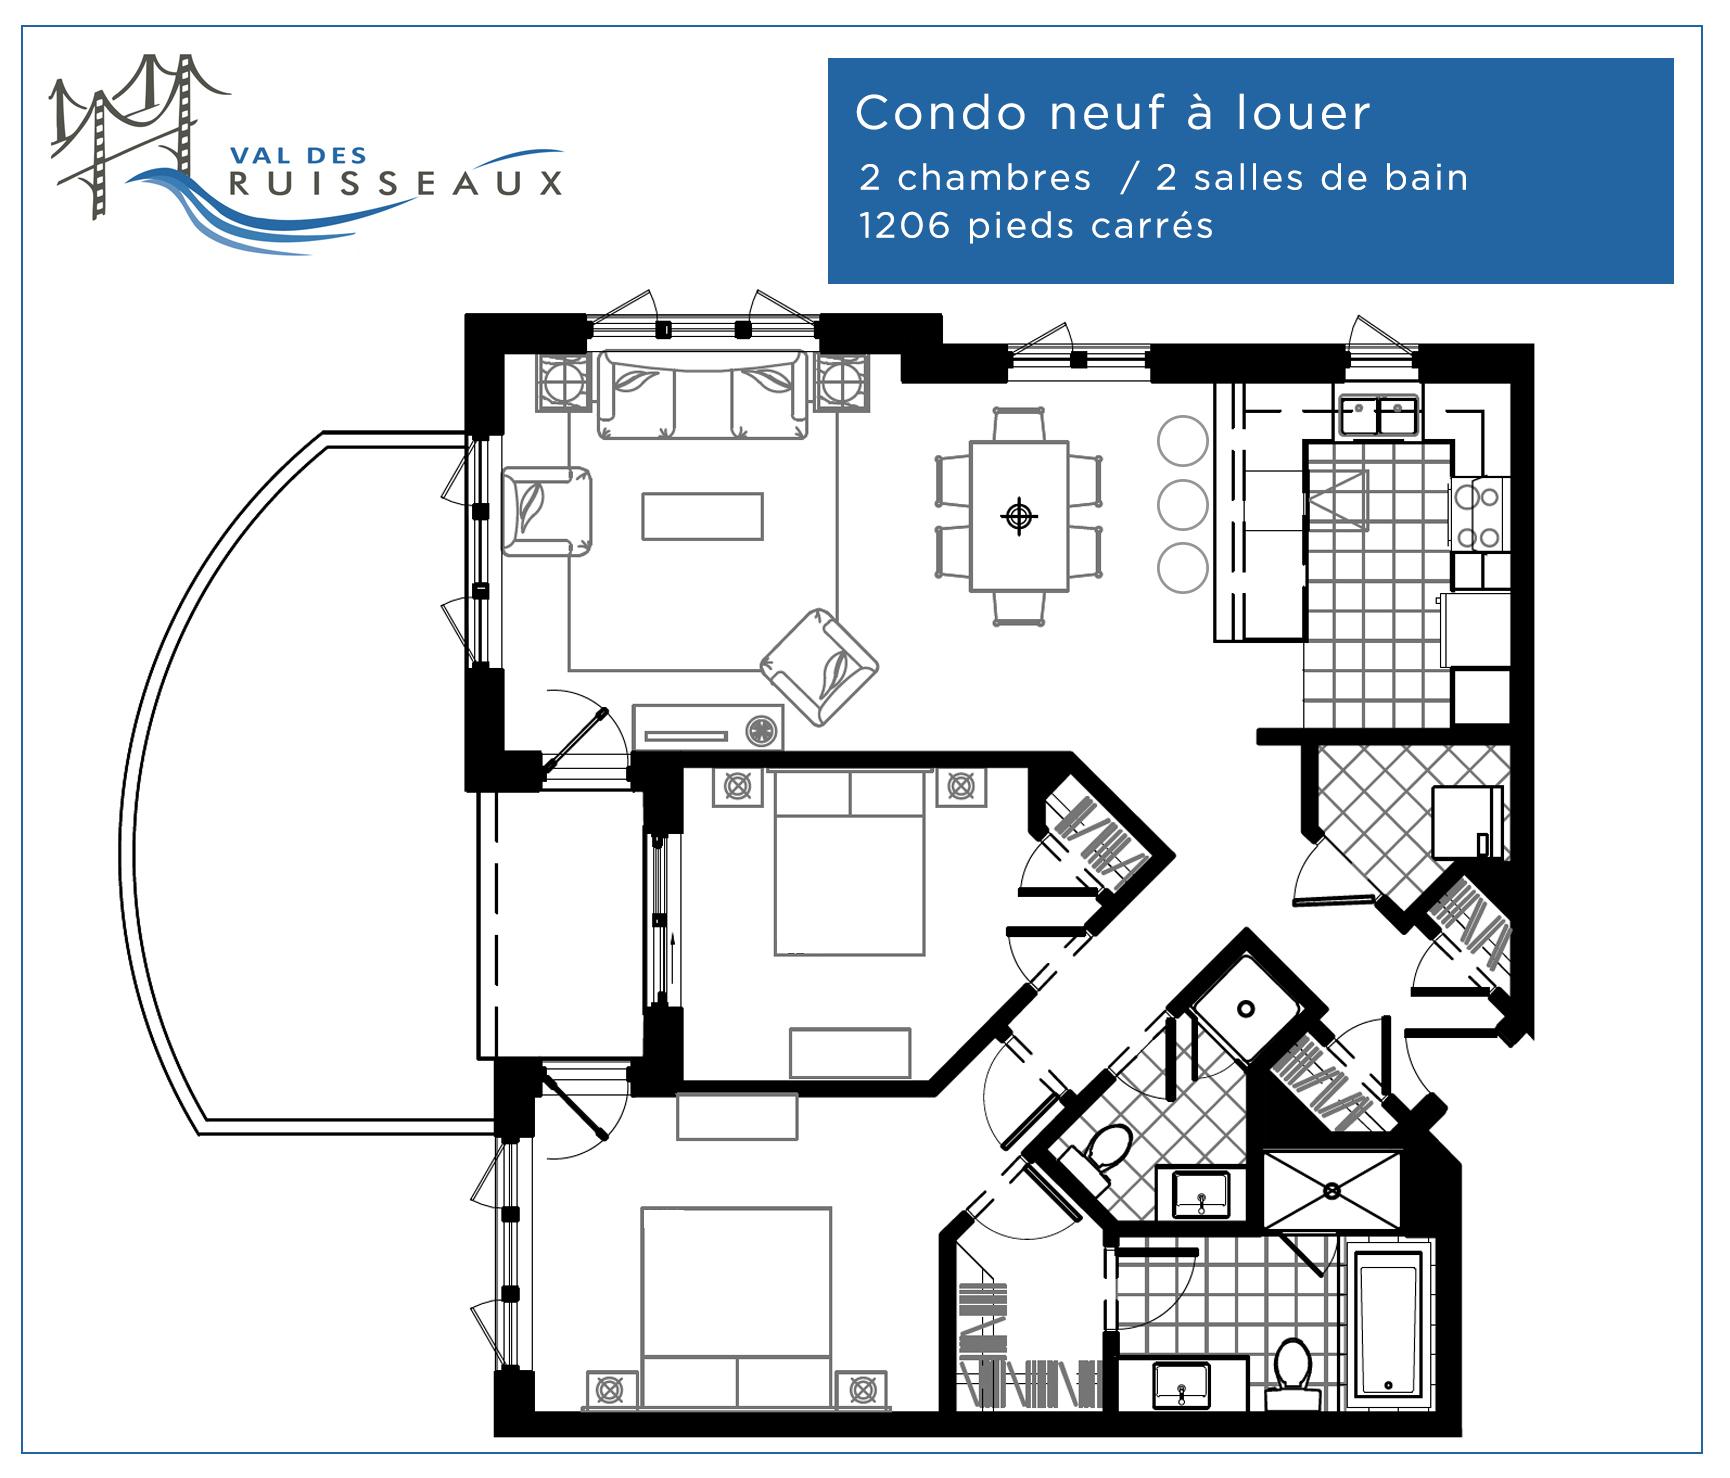 plans-vdr-2cac-1206-v3-fr